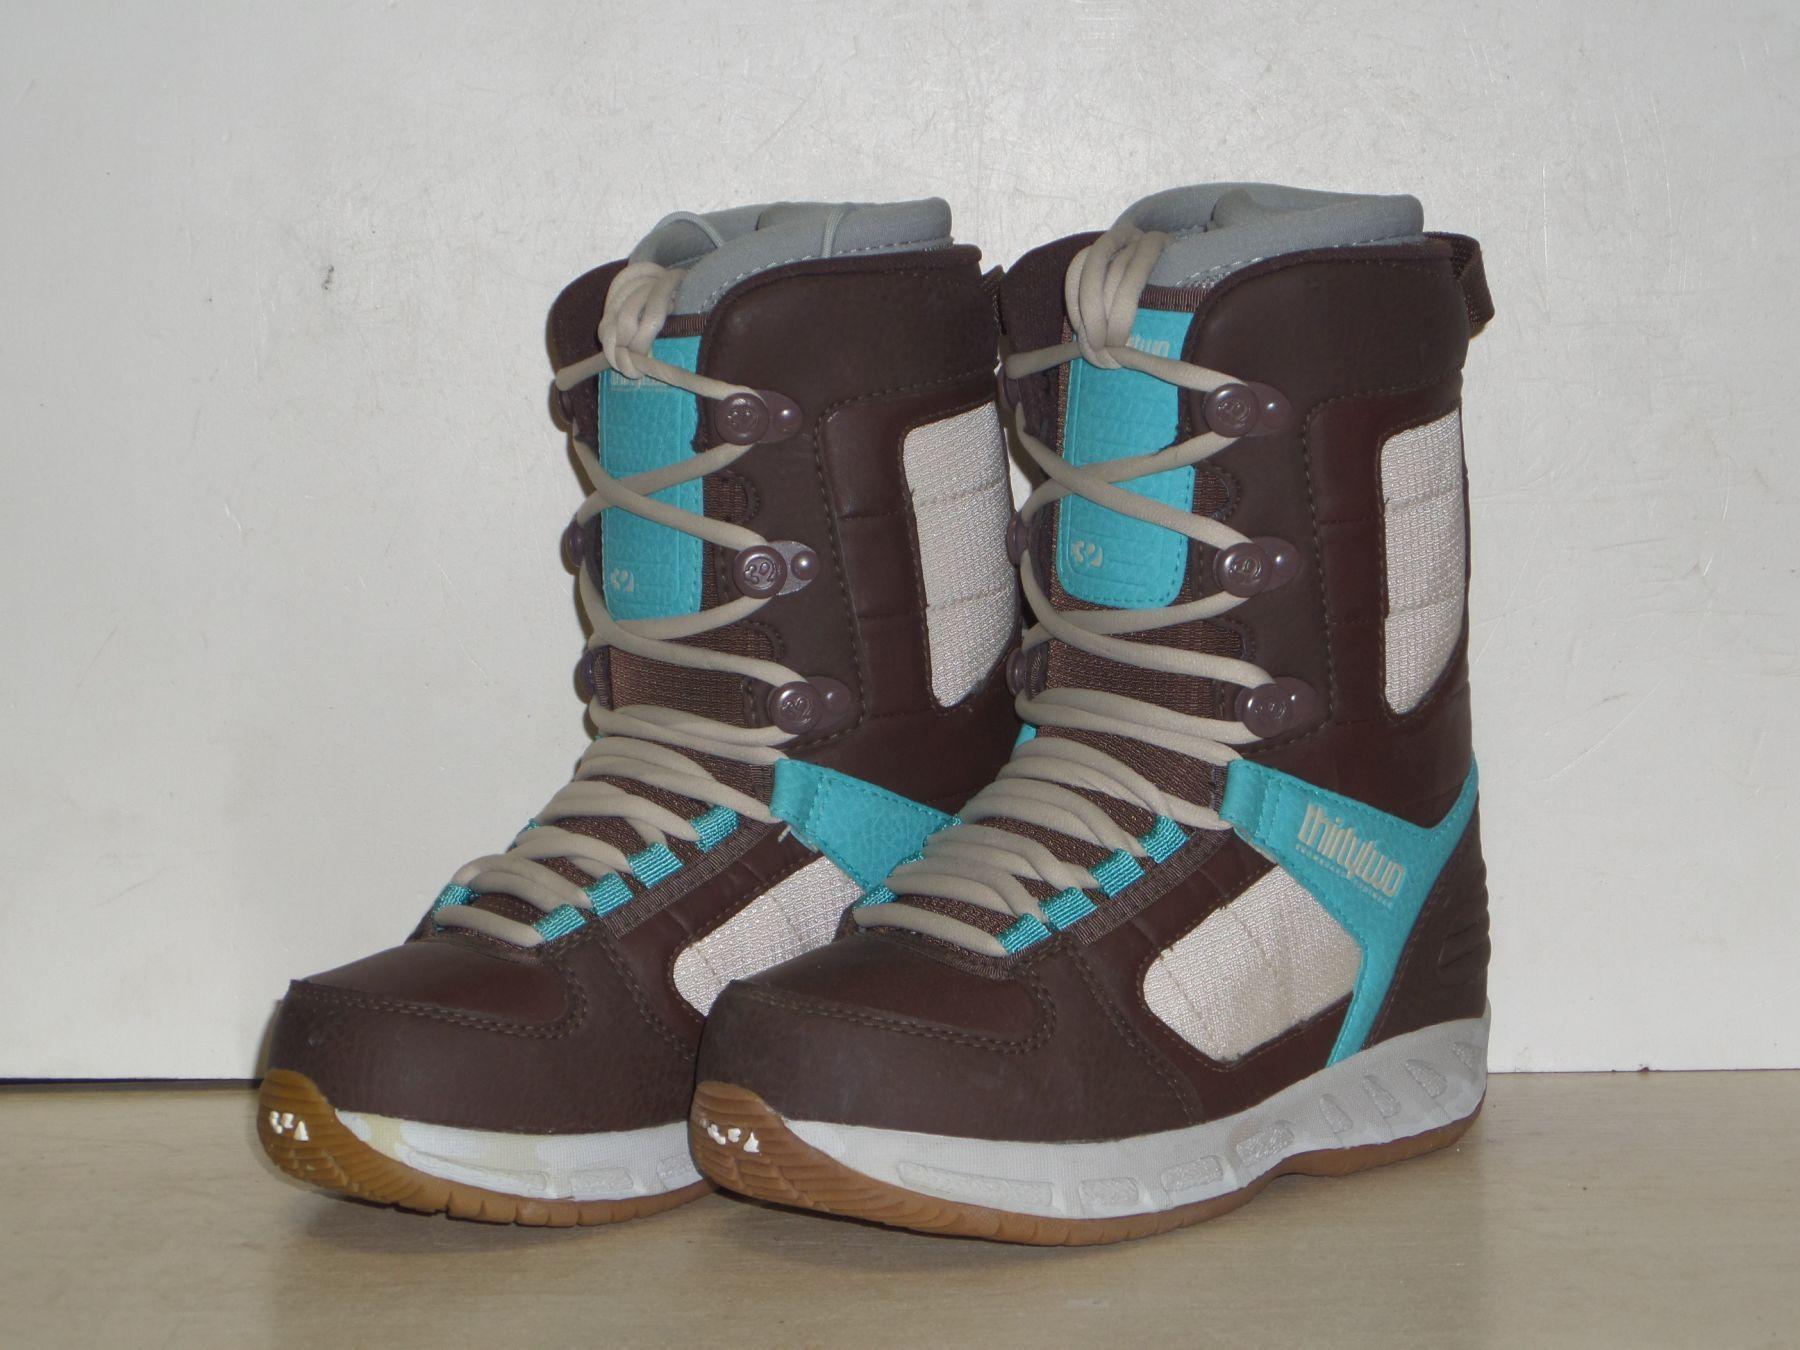 b14f26c1cfbd Ботинки для сноуборда Thirtytwo Exus W s (размер 35,5) - купить по ...